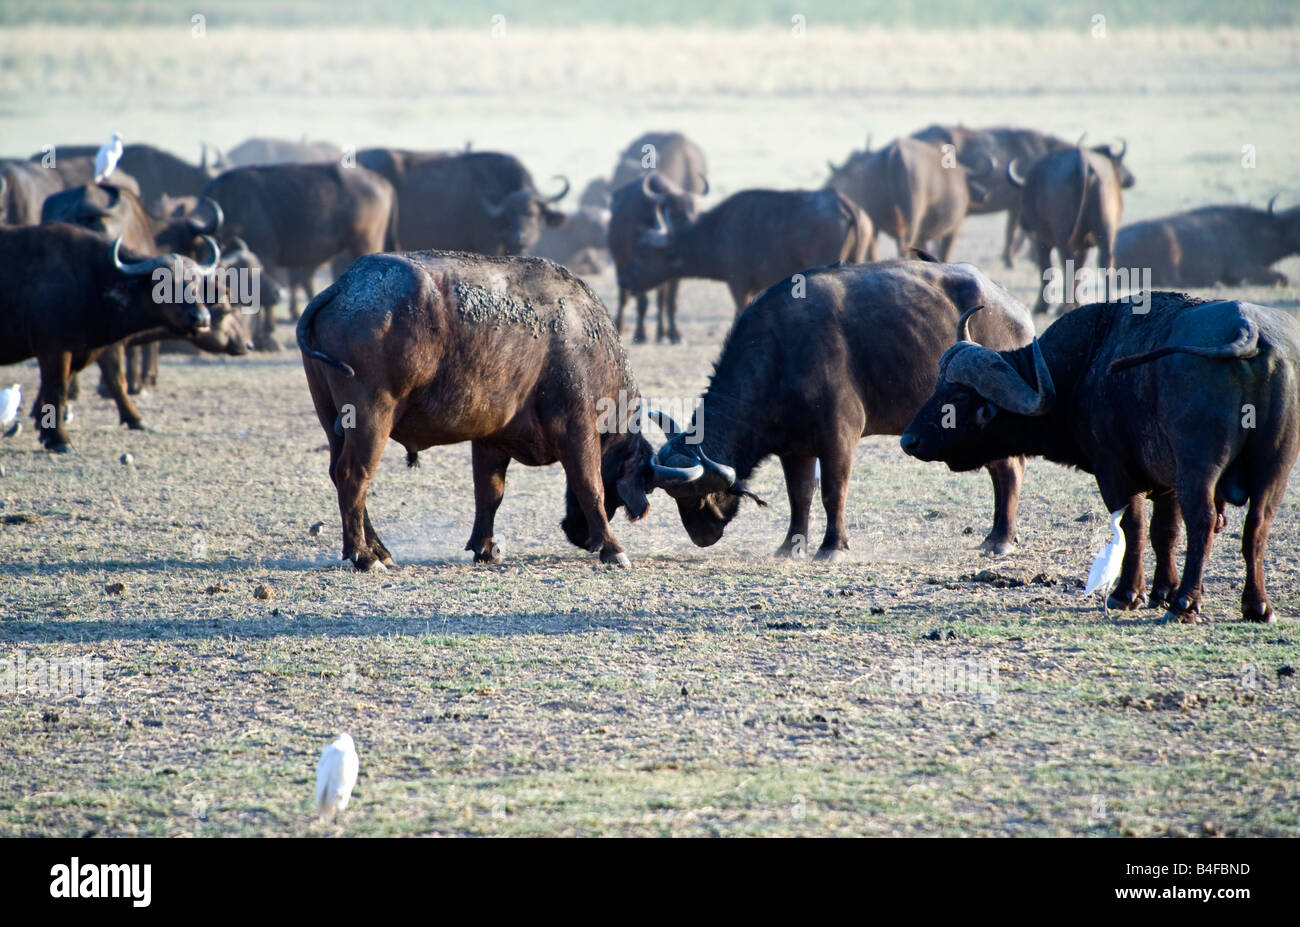 Tanzania Lake Manyara National Park a buffalos herd Syncerus caffer - Stock Image